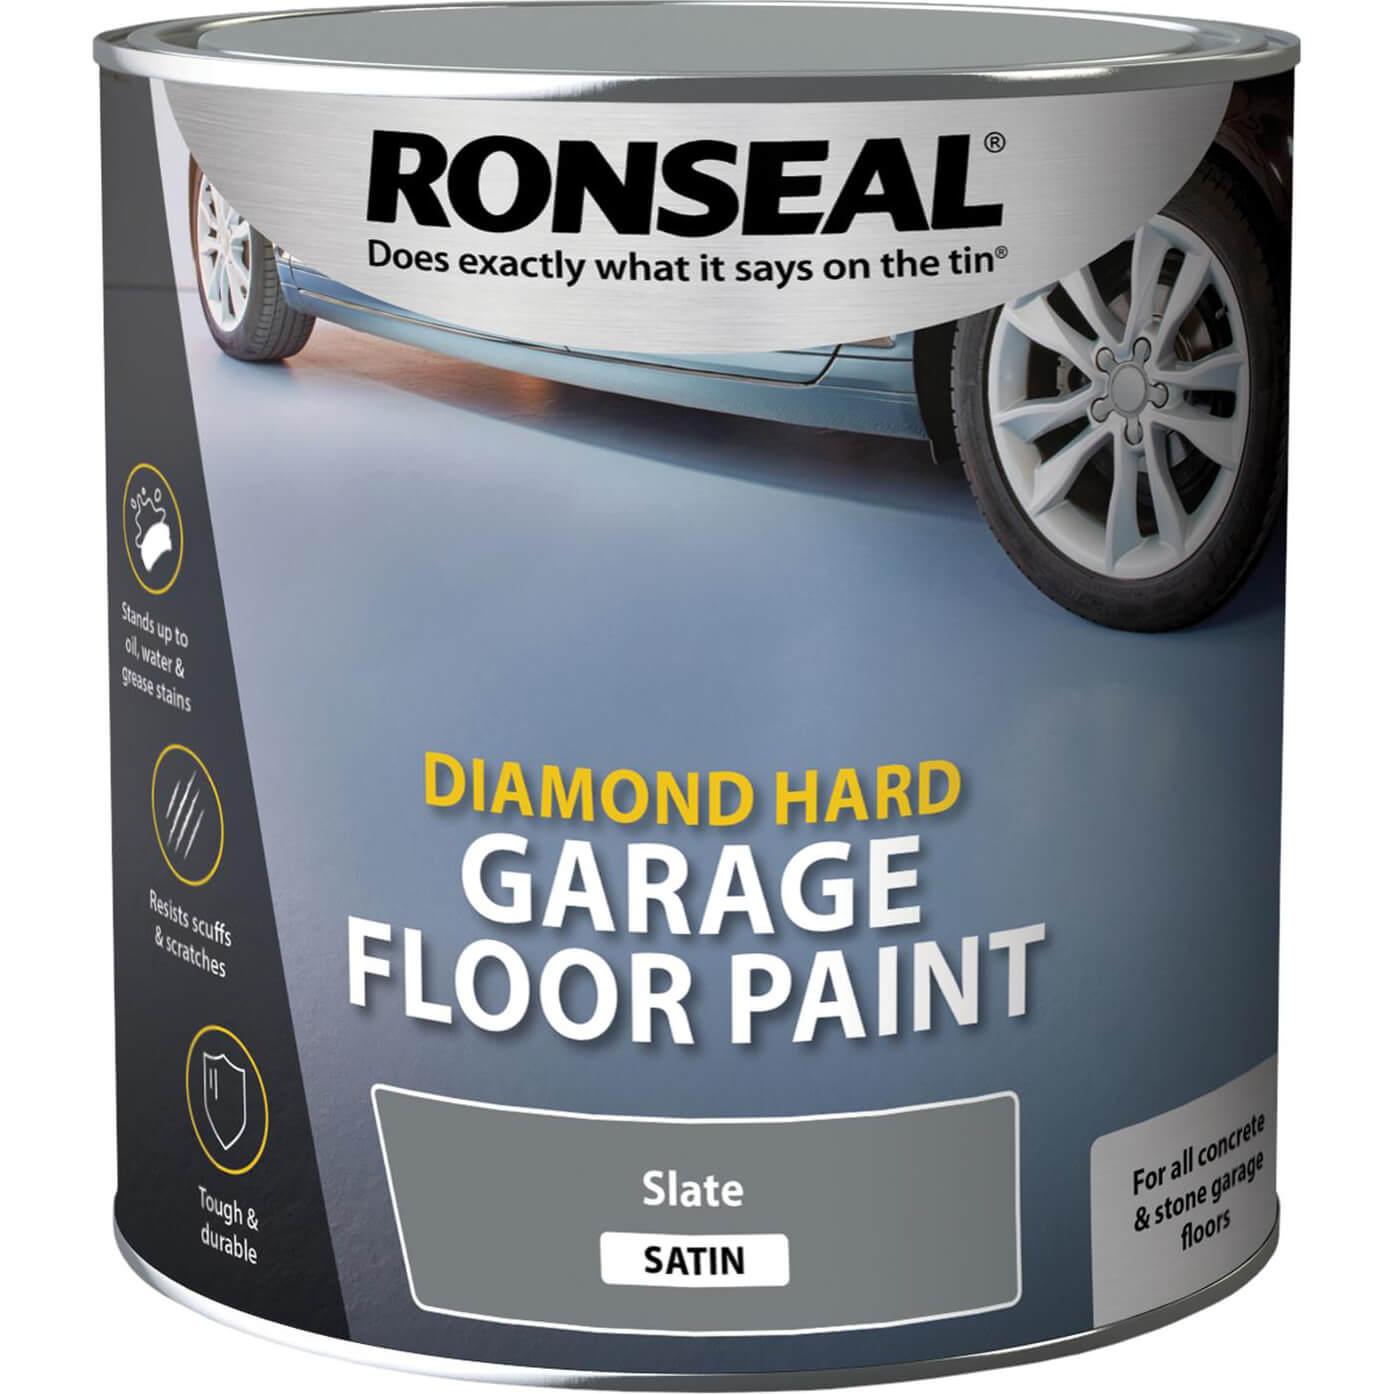 Image of Ronseal Diamond Hard Garage Floor Paint Slate 2.5l